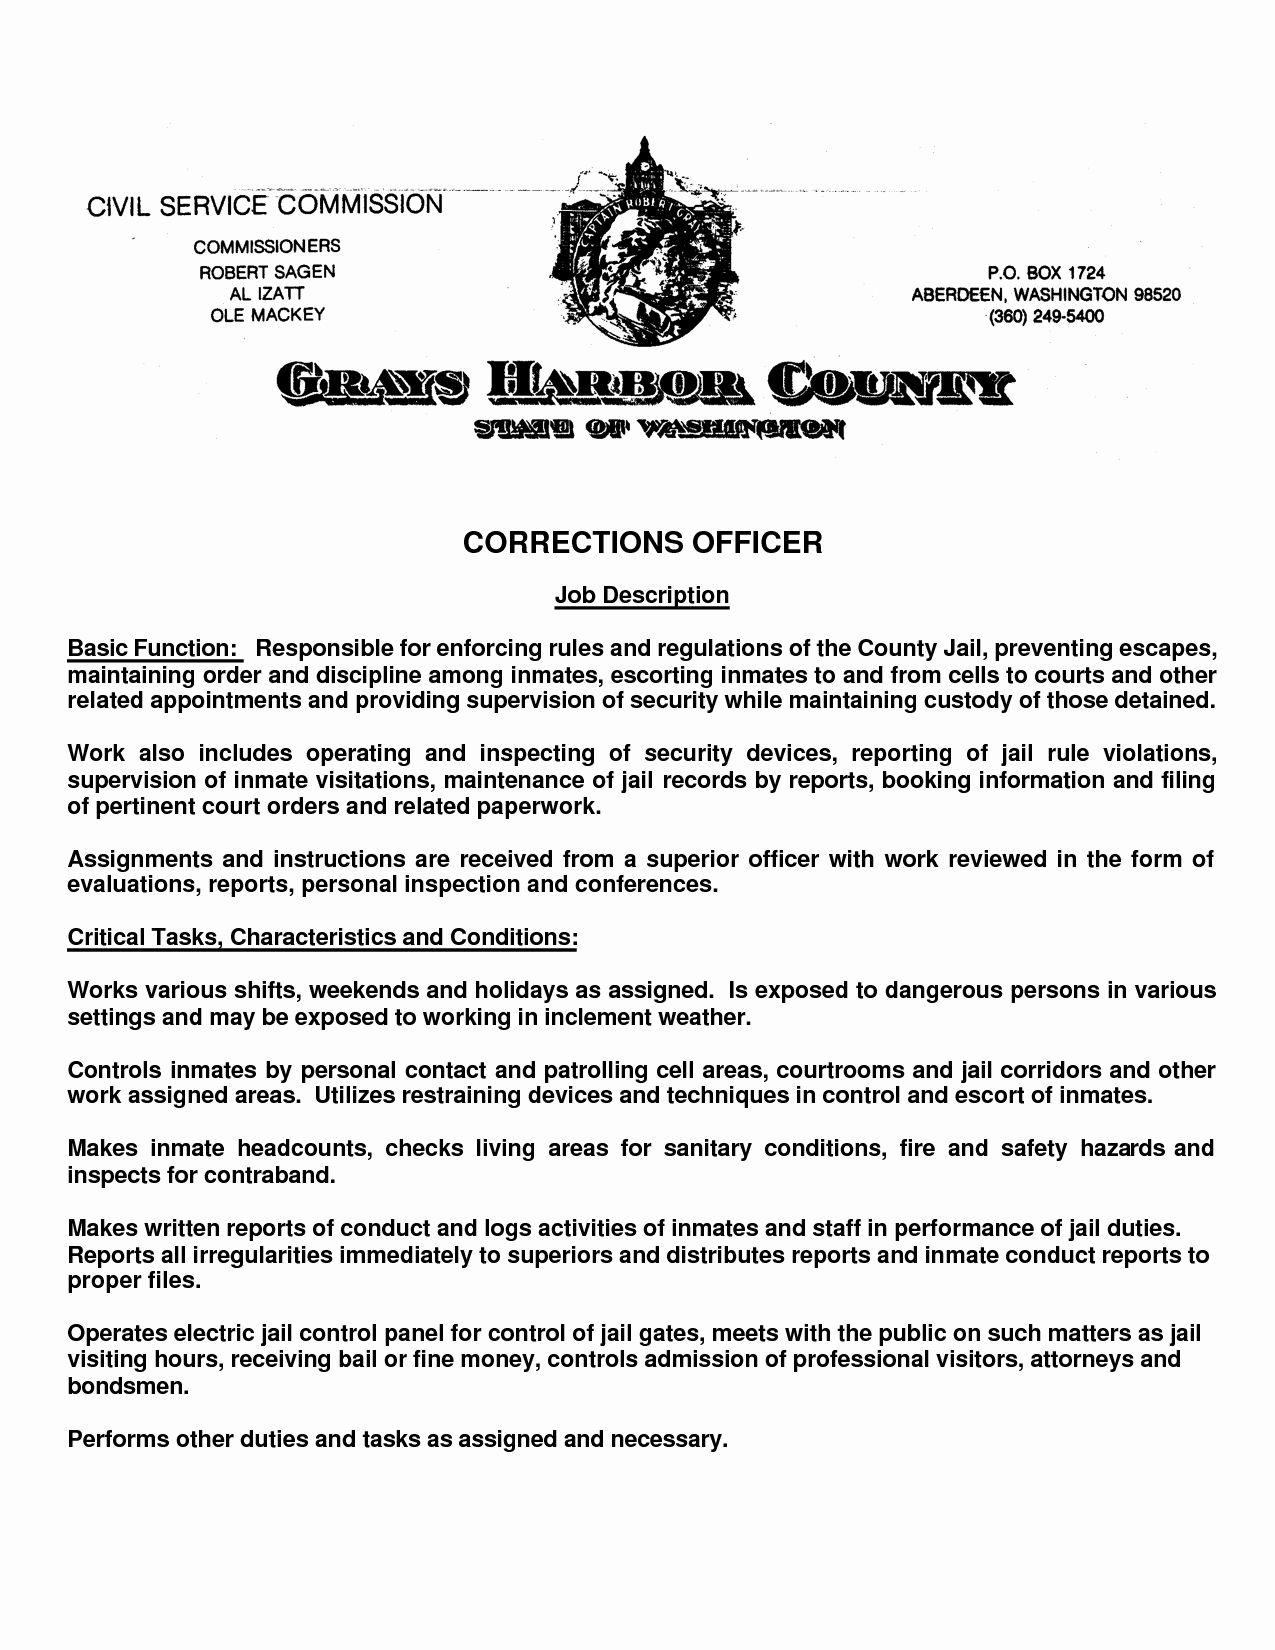 Correctional officer job description resume awesome